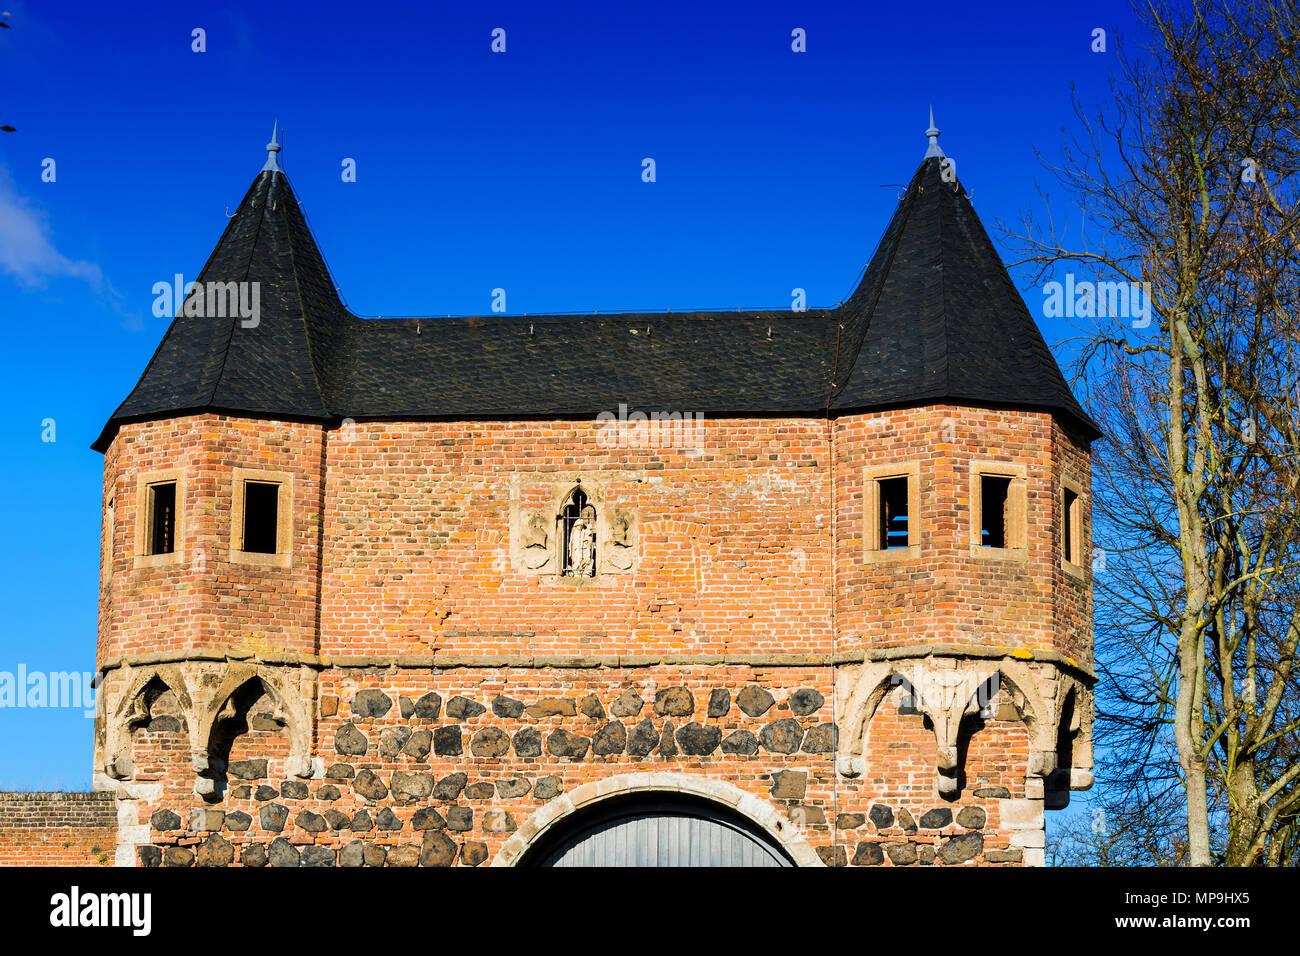 Zons, South Gate in Dormagen-Zons, Niederrhein, North Rhine-Westphalia - Stock Image